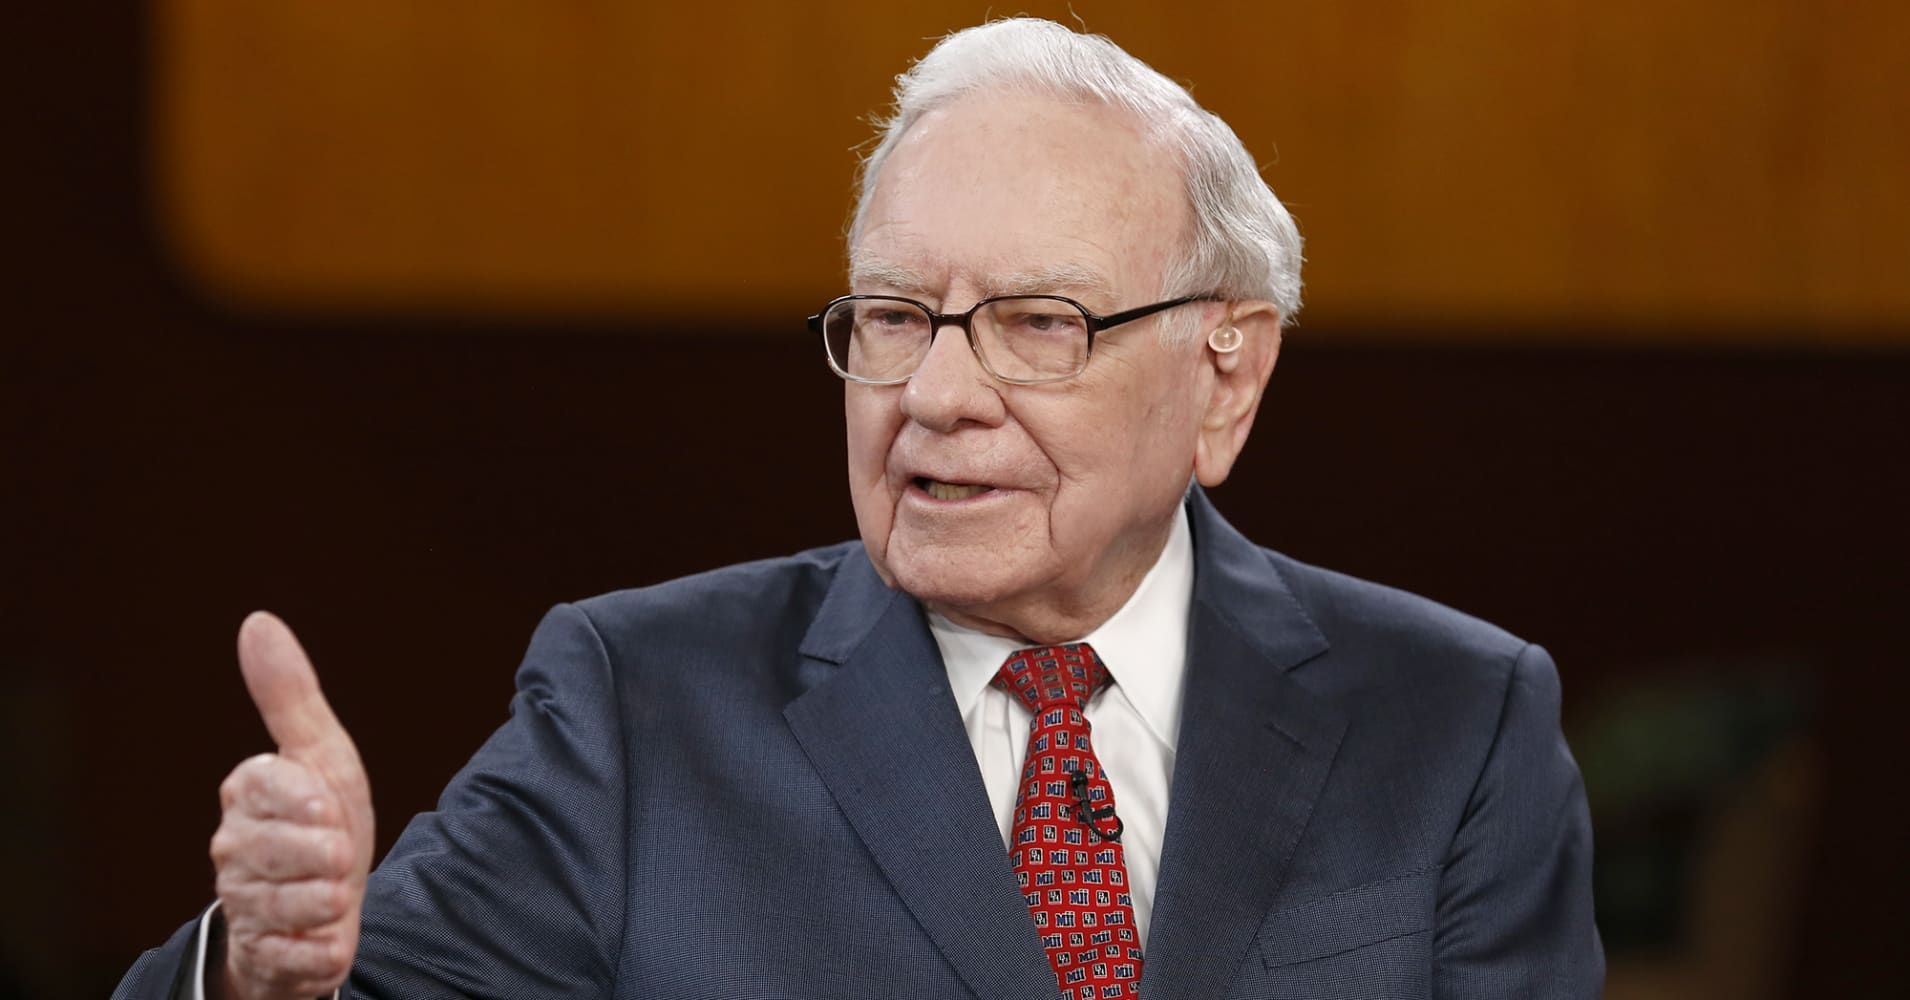 cnbc.com - Thomas Franck - Berkshire Hathaway reveals stake in JP Morgan as Warren Buffett raises bet on the US banking system